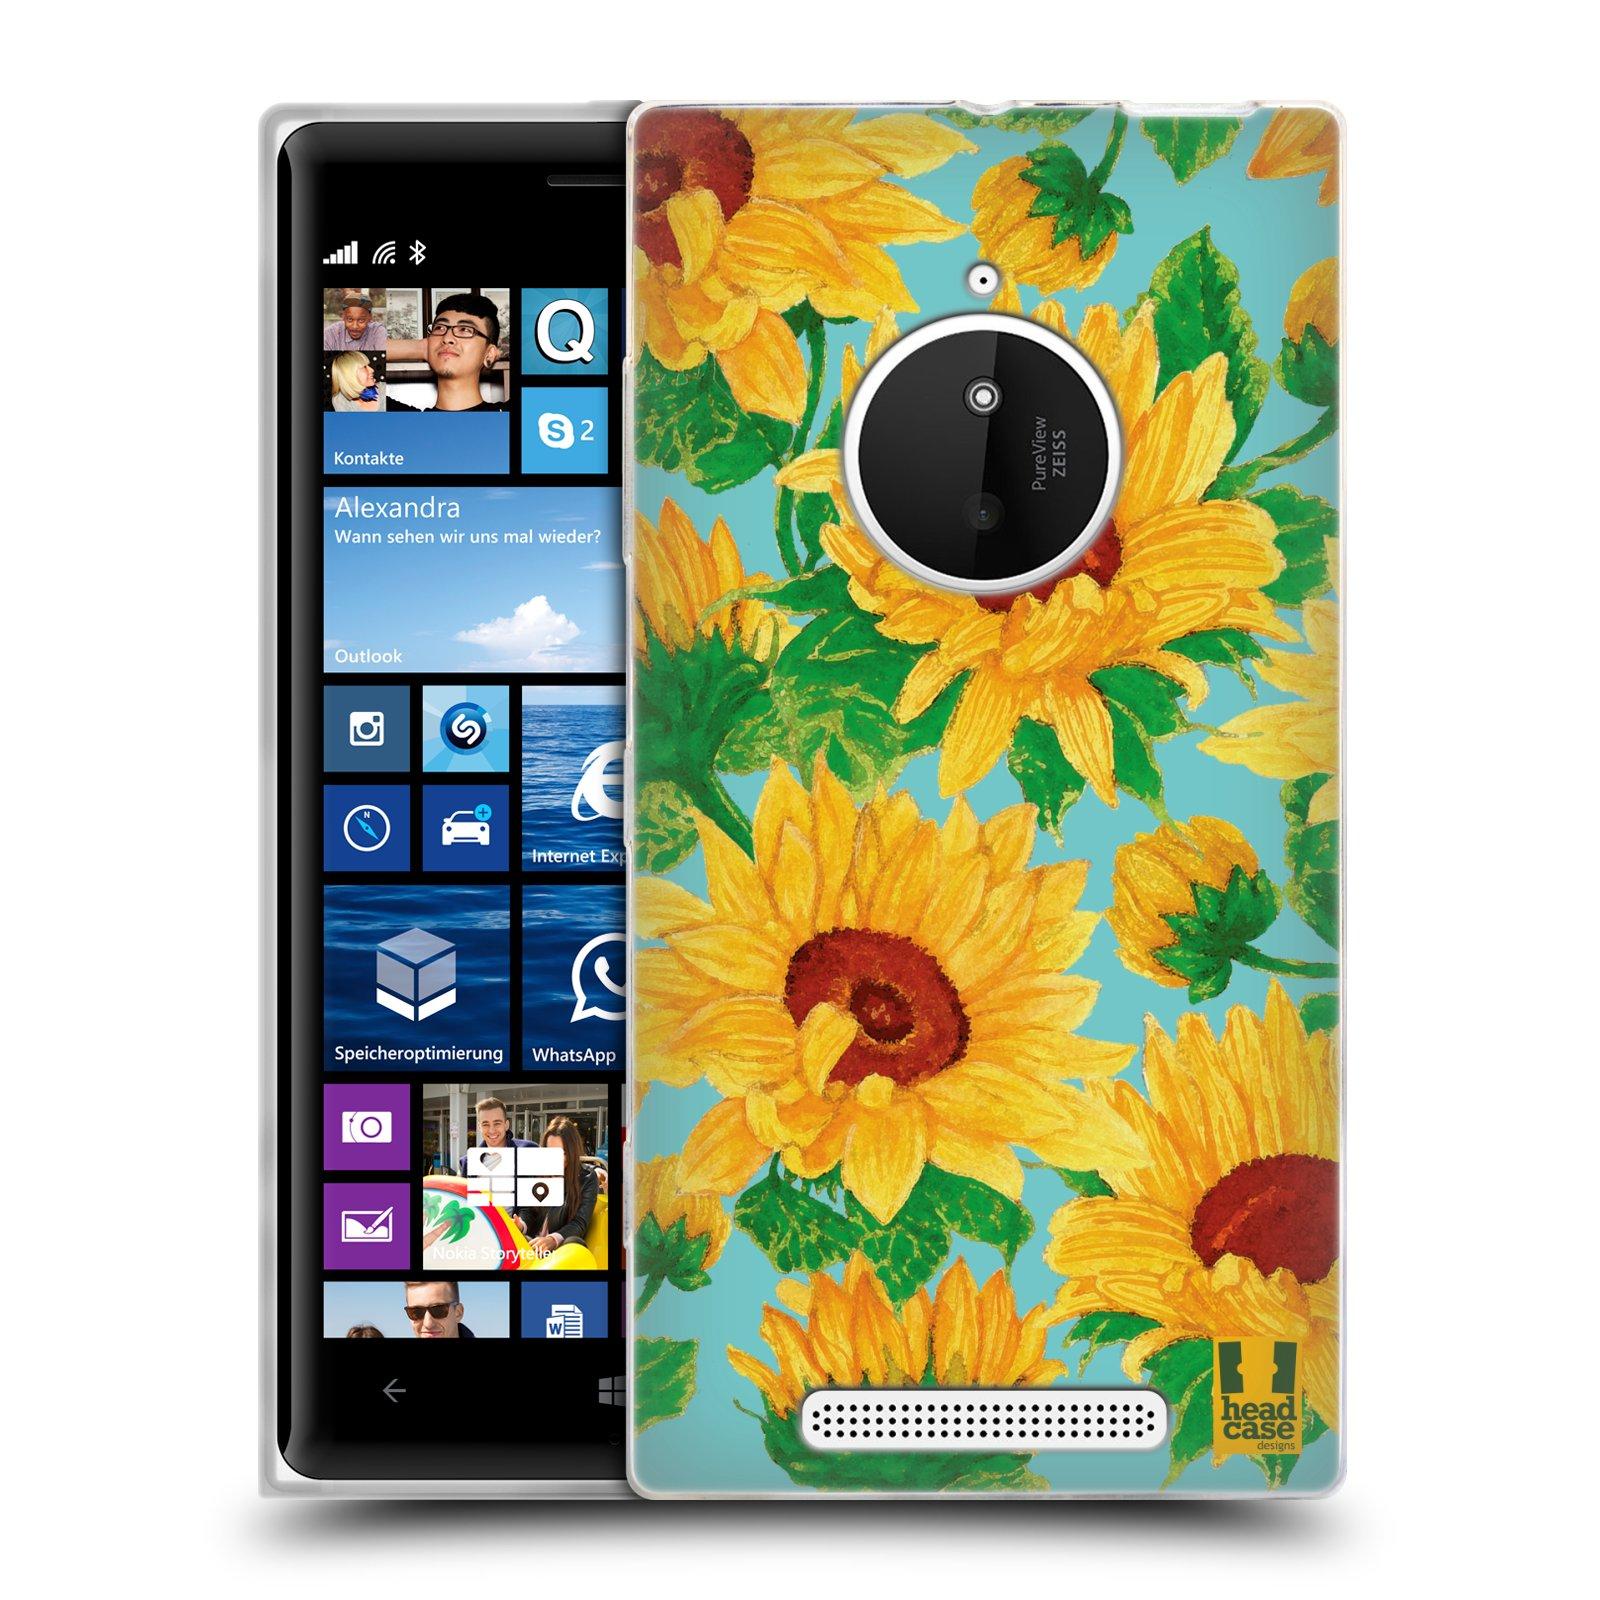 Silikonové pouzdro na mobil Nokia Lumia 830 HEAD CASE Slunečnice (Silikonový kryt či obal na mobilní telefon Nokia Lumia 830)